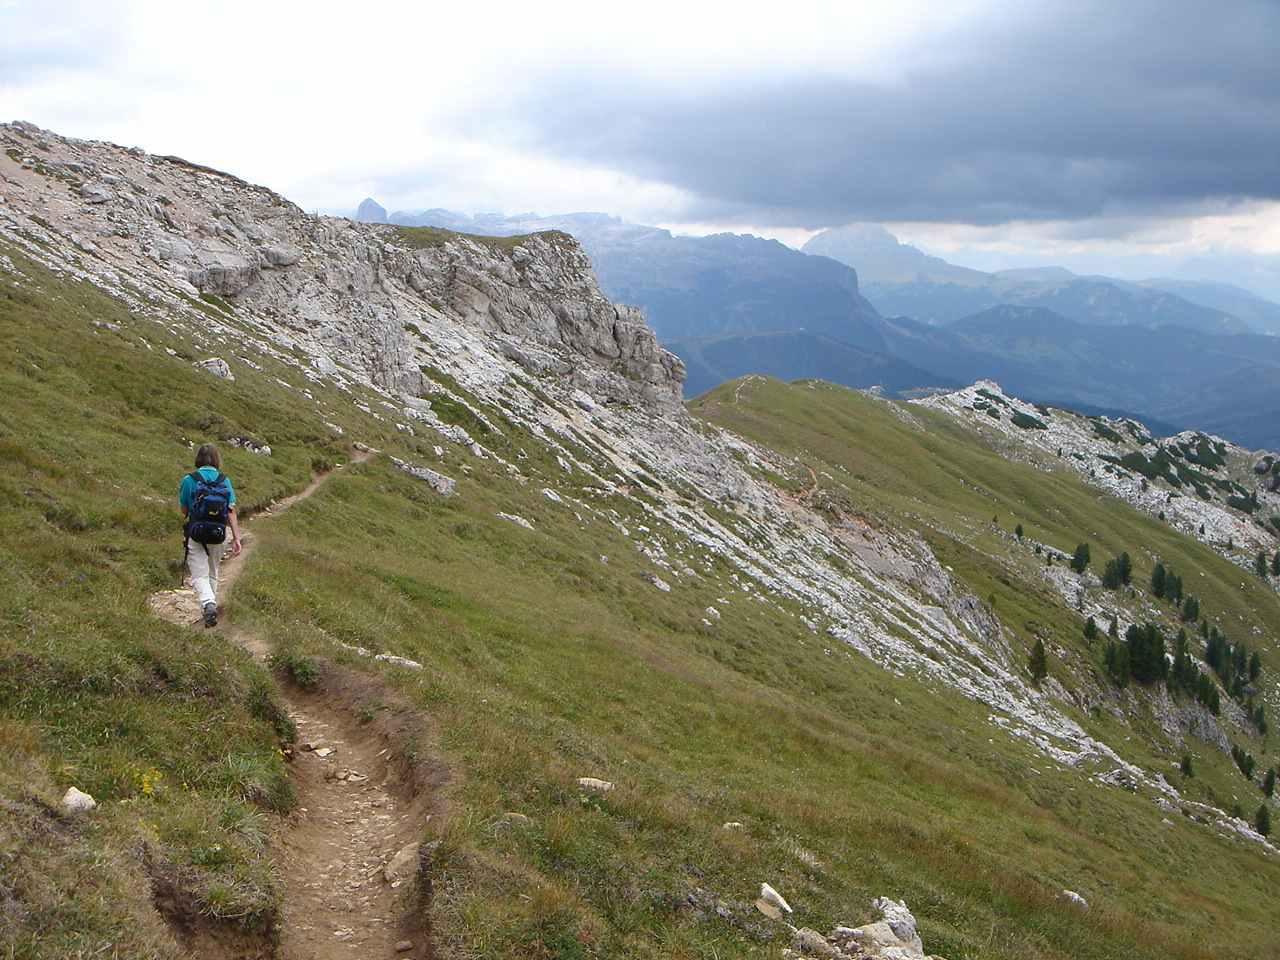 Foto: Manfred Karl / Wandertour / Settsass (2571m) / Abstieg vom Settsass gegen Le Pizzade, im Hintergrund Sellastock. / 05.05.2007 18:55:36